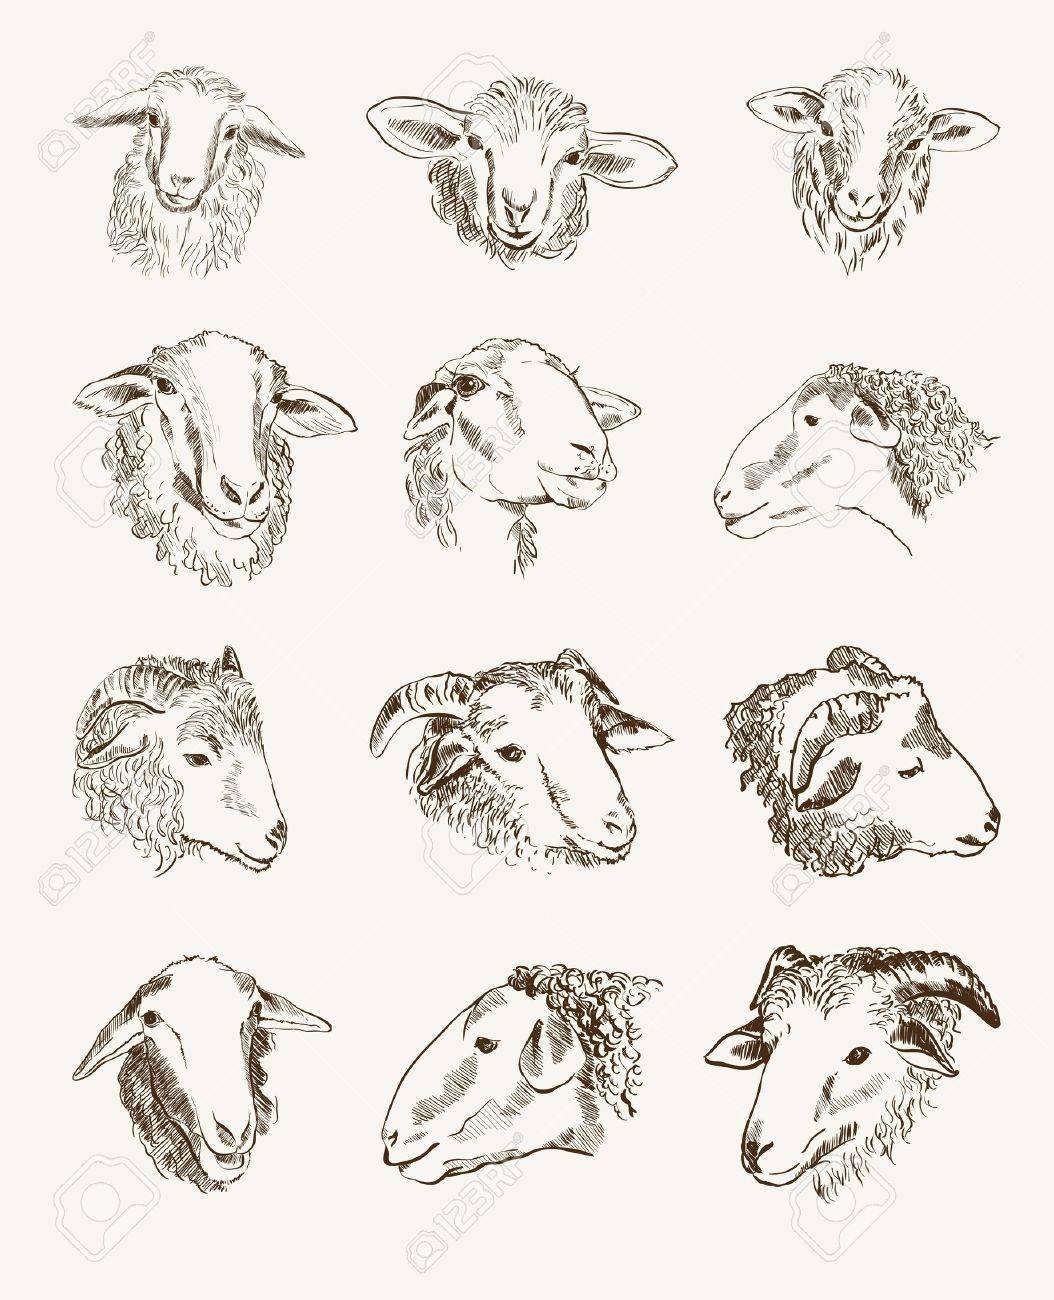 head of farm animals set vector sketches - 26916628